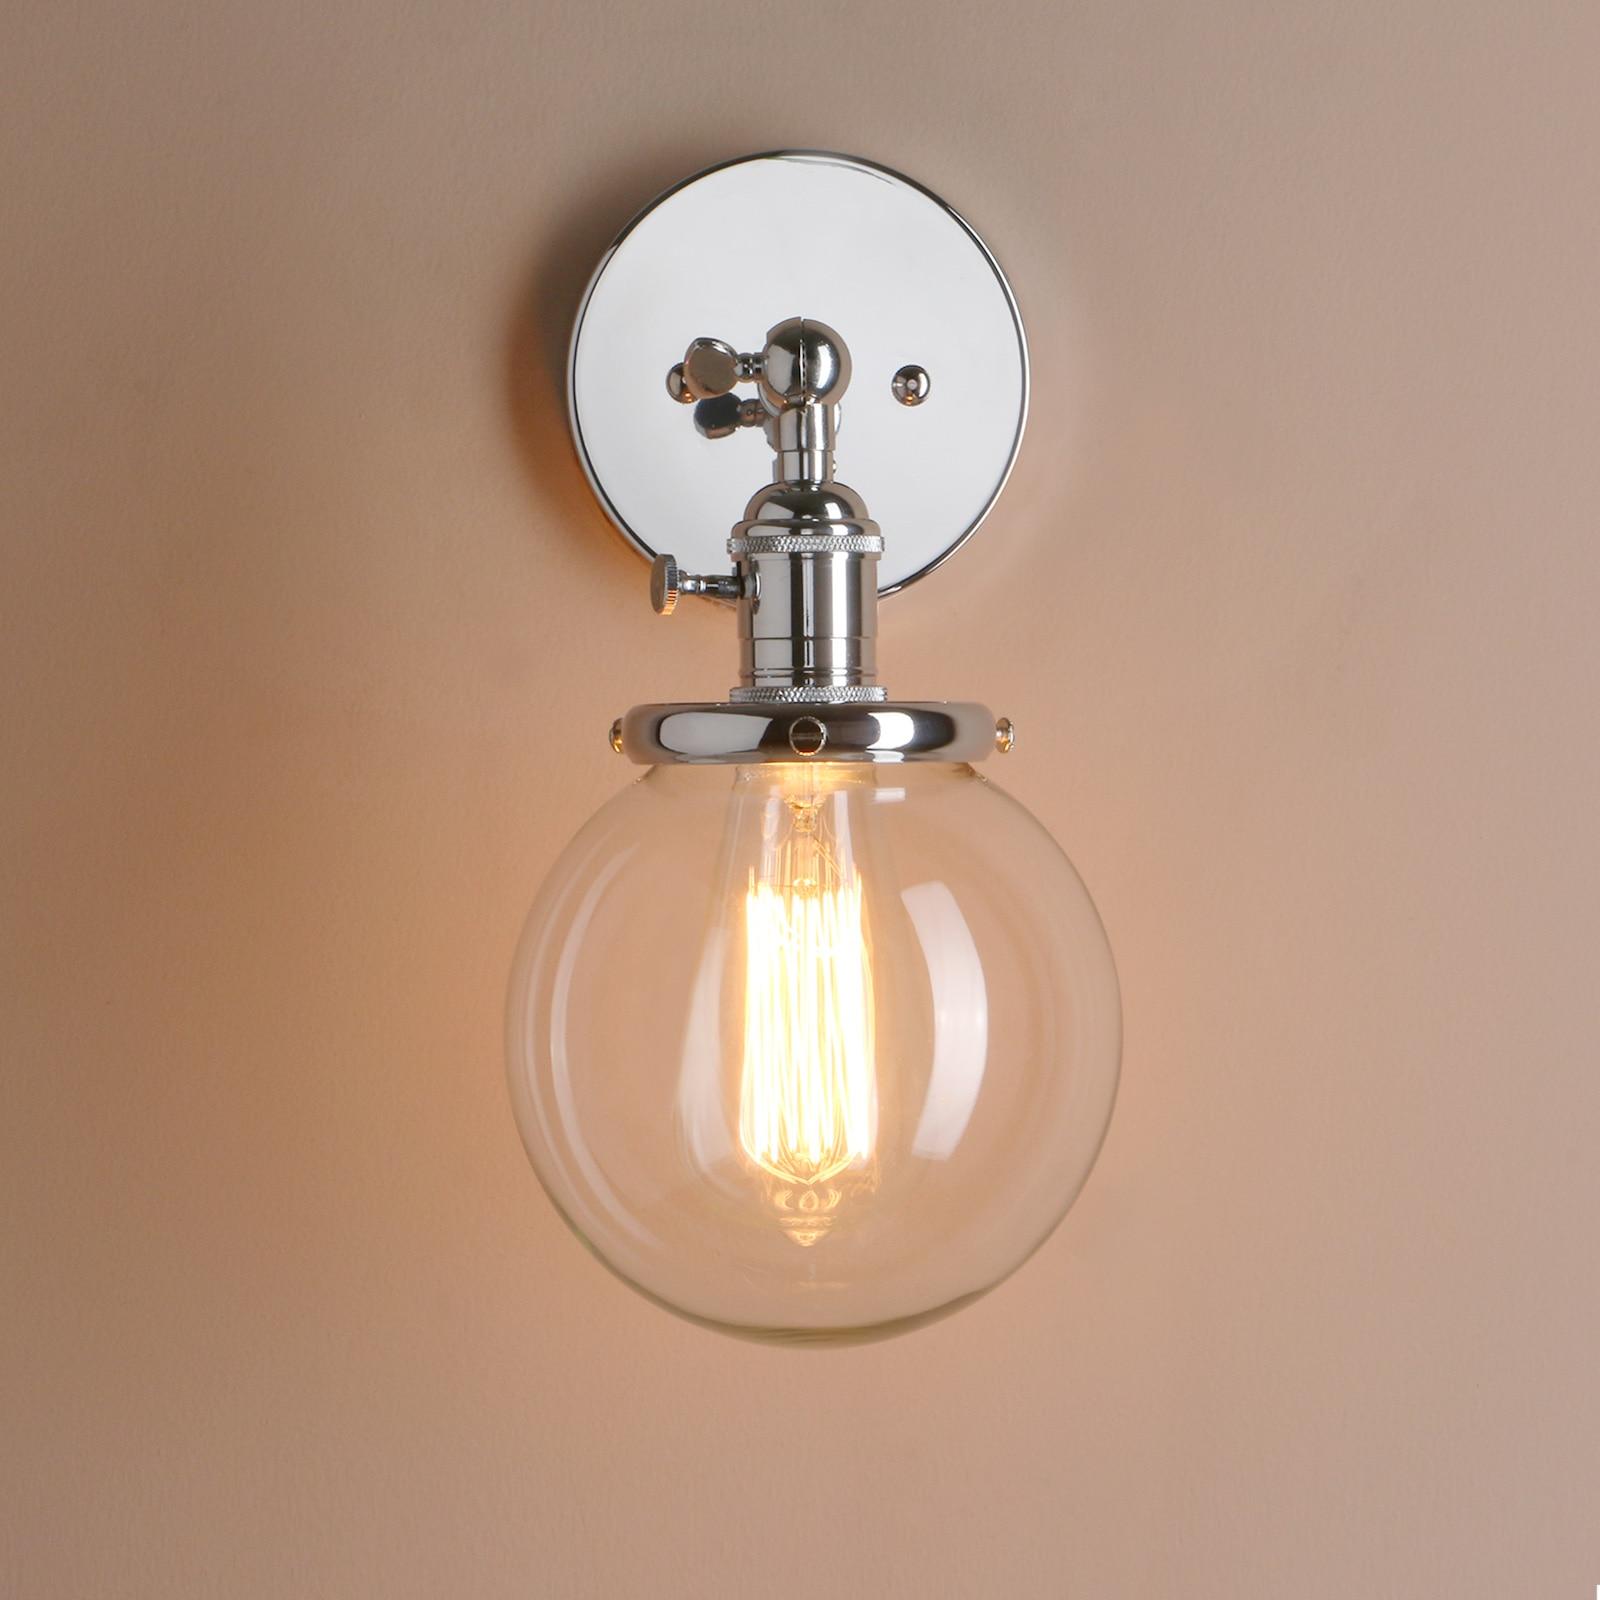 High Quality wall lamp e27